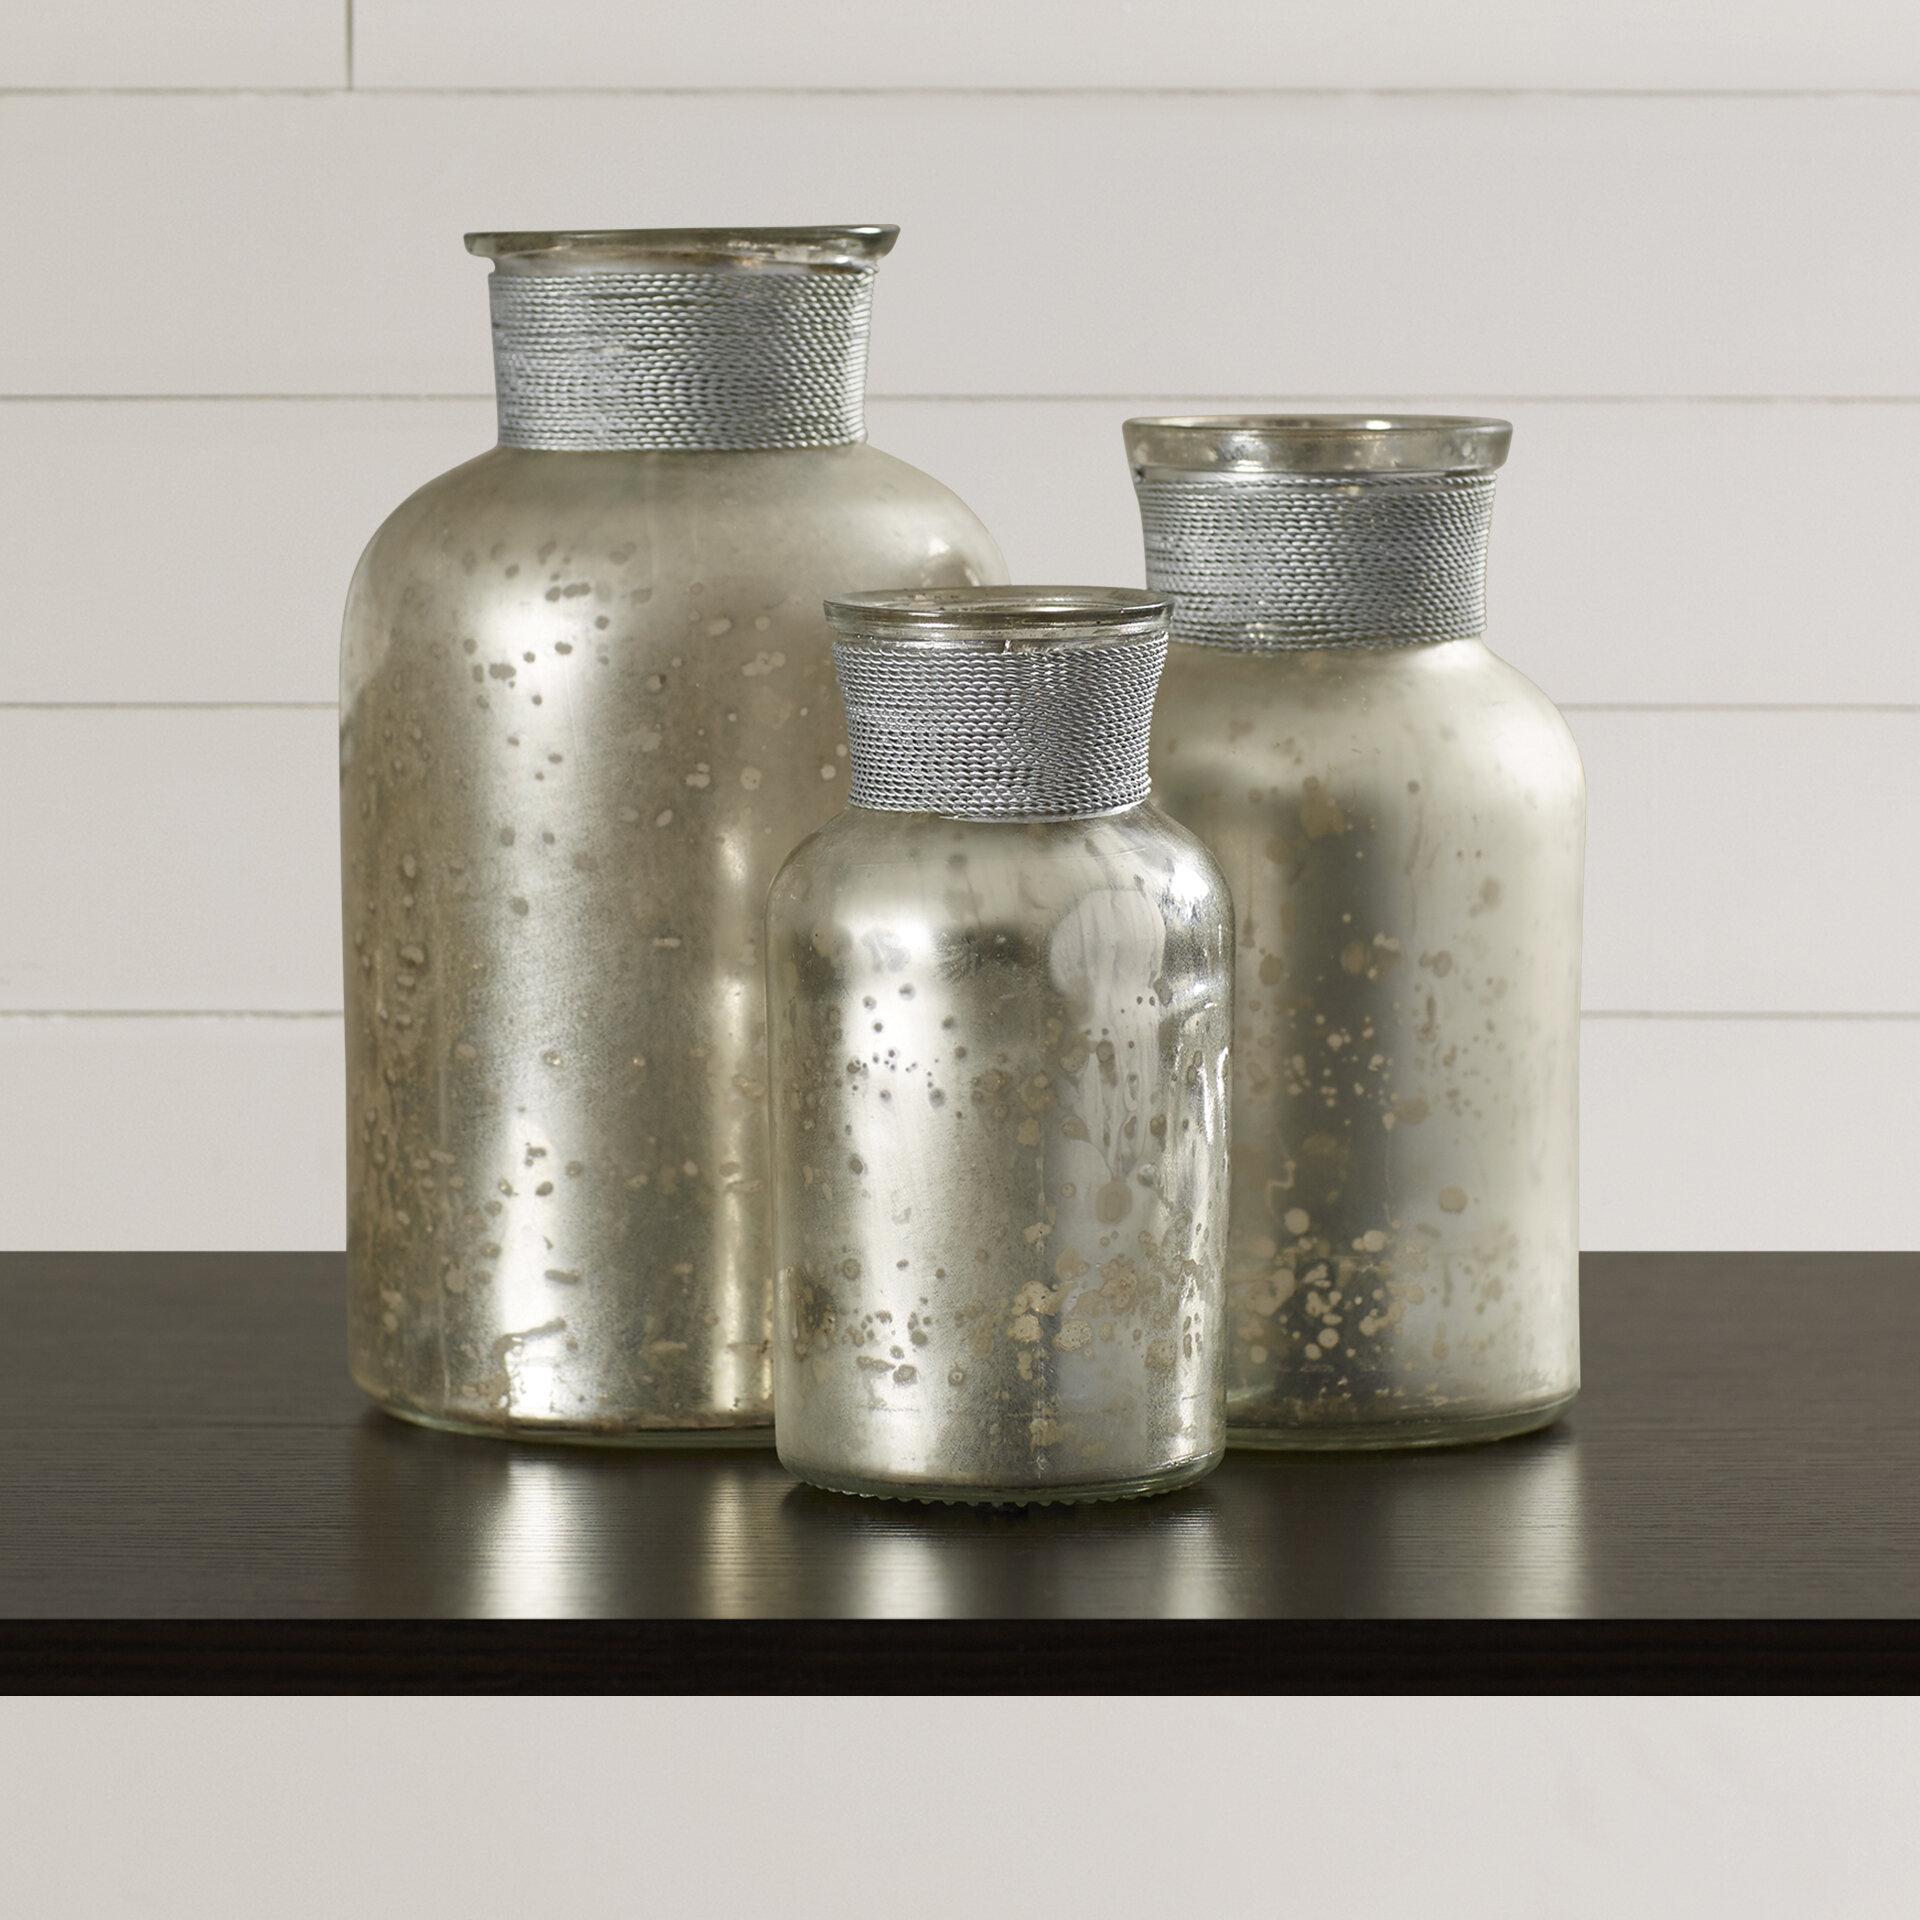 Myhre 3 Piece Decorative Bottle Set